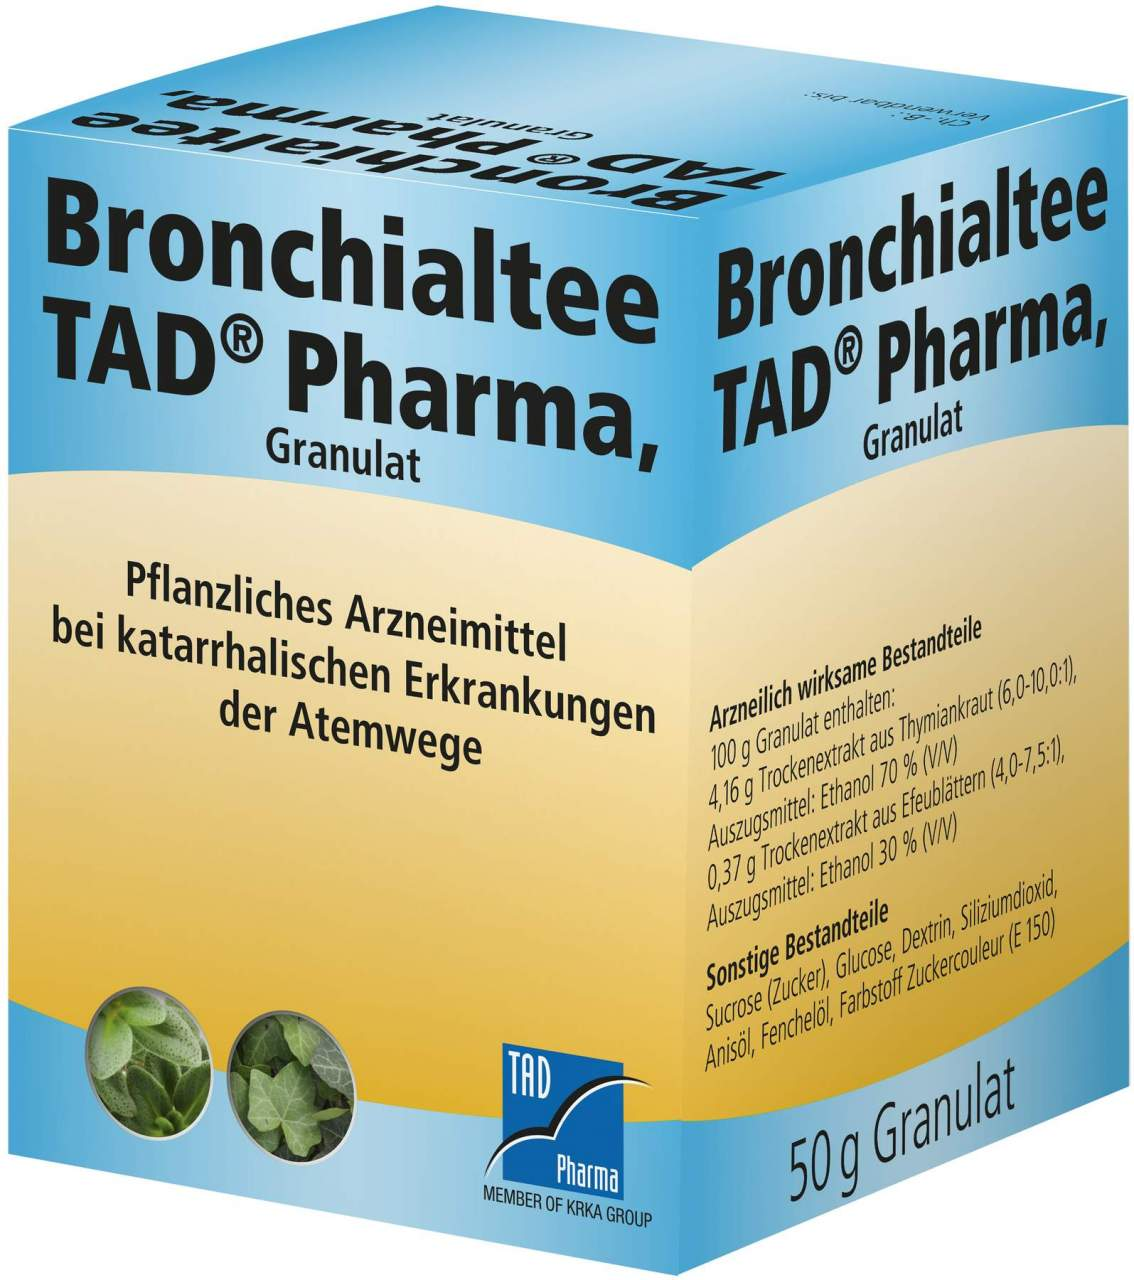 Bronchialtee TAD Pharma 50 g Granulat